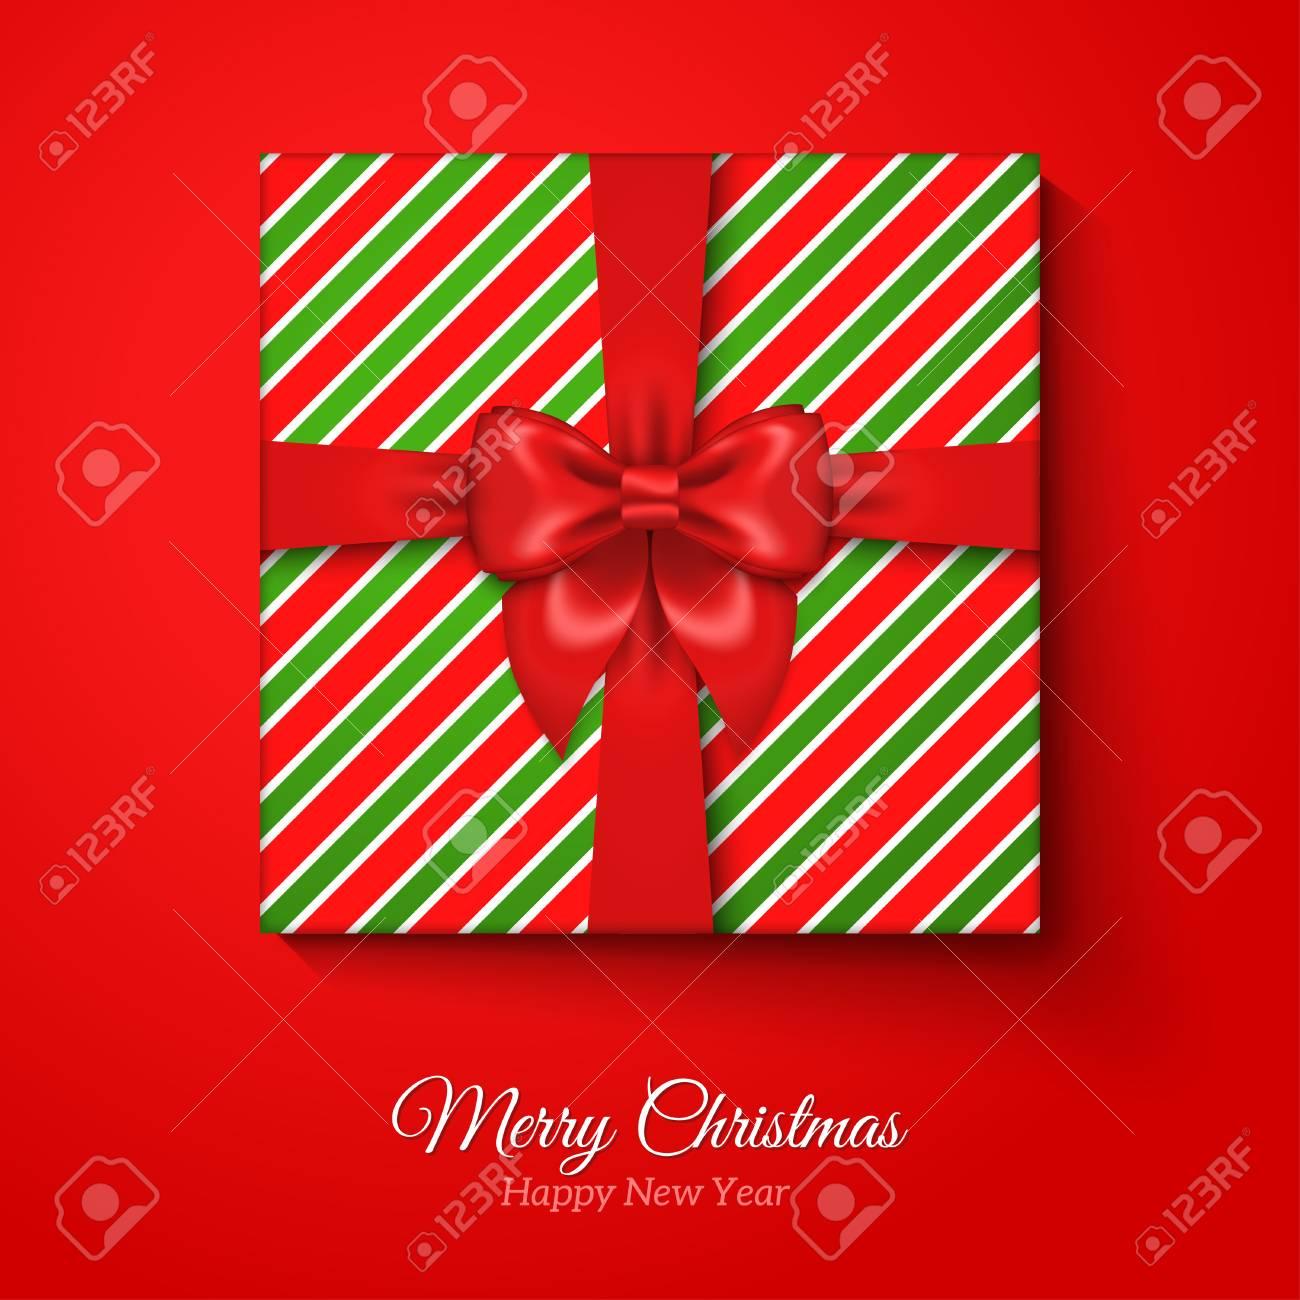 Merry Christmas Greeting Card With Christmas Gift Box Res Silk